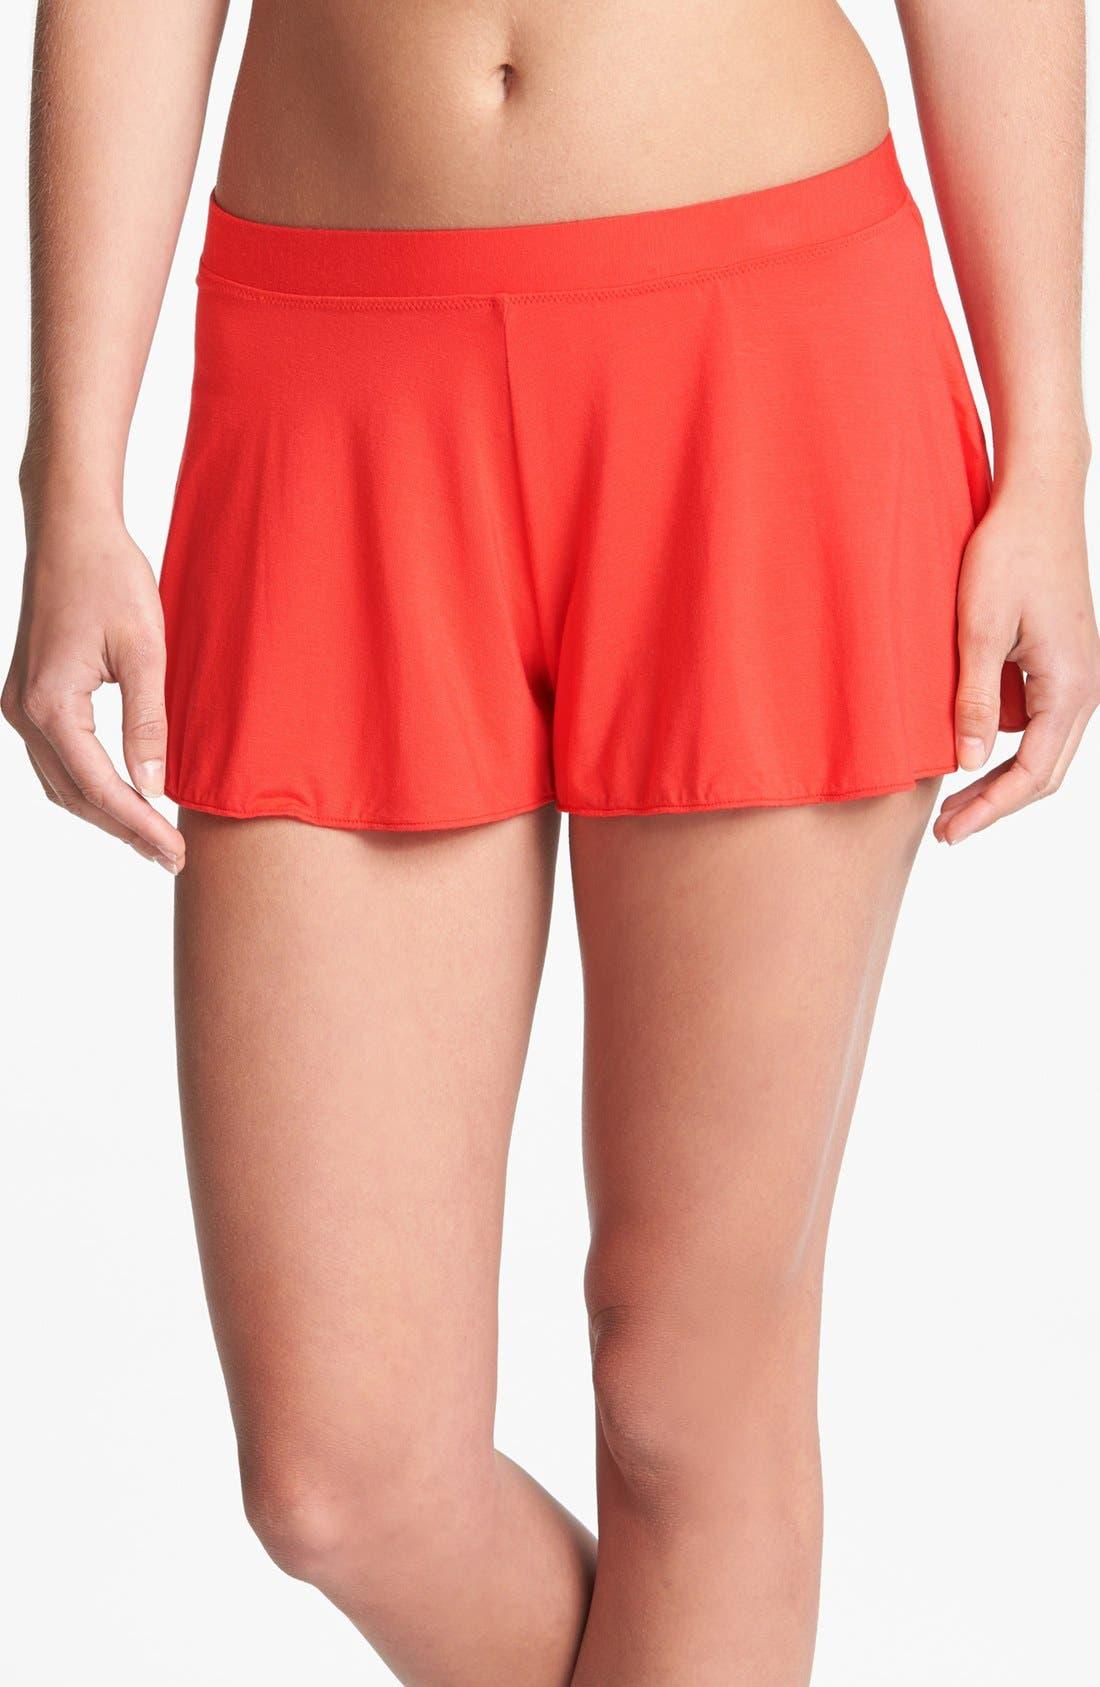 Alternate Image 1 Selected - Splendid Drapey Knit Shorts